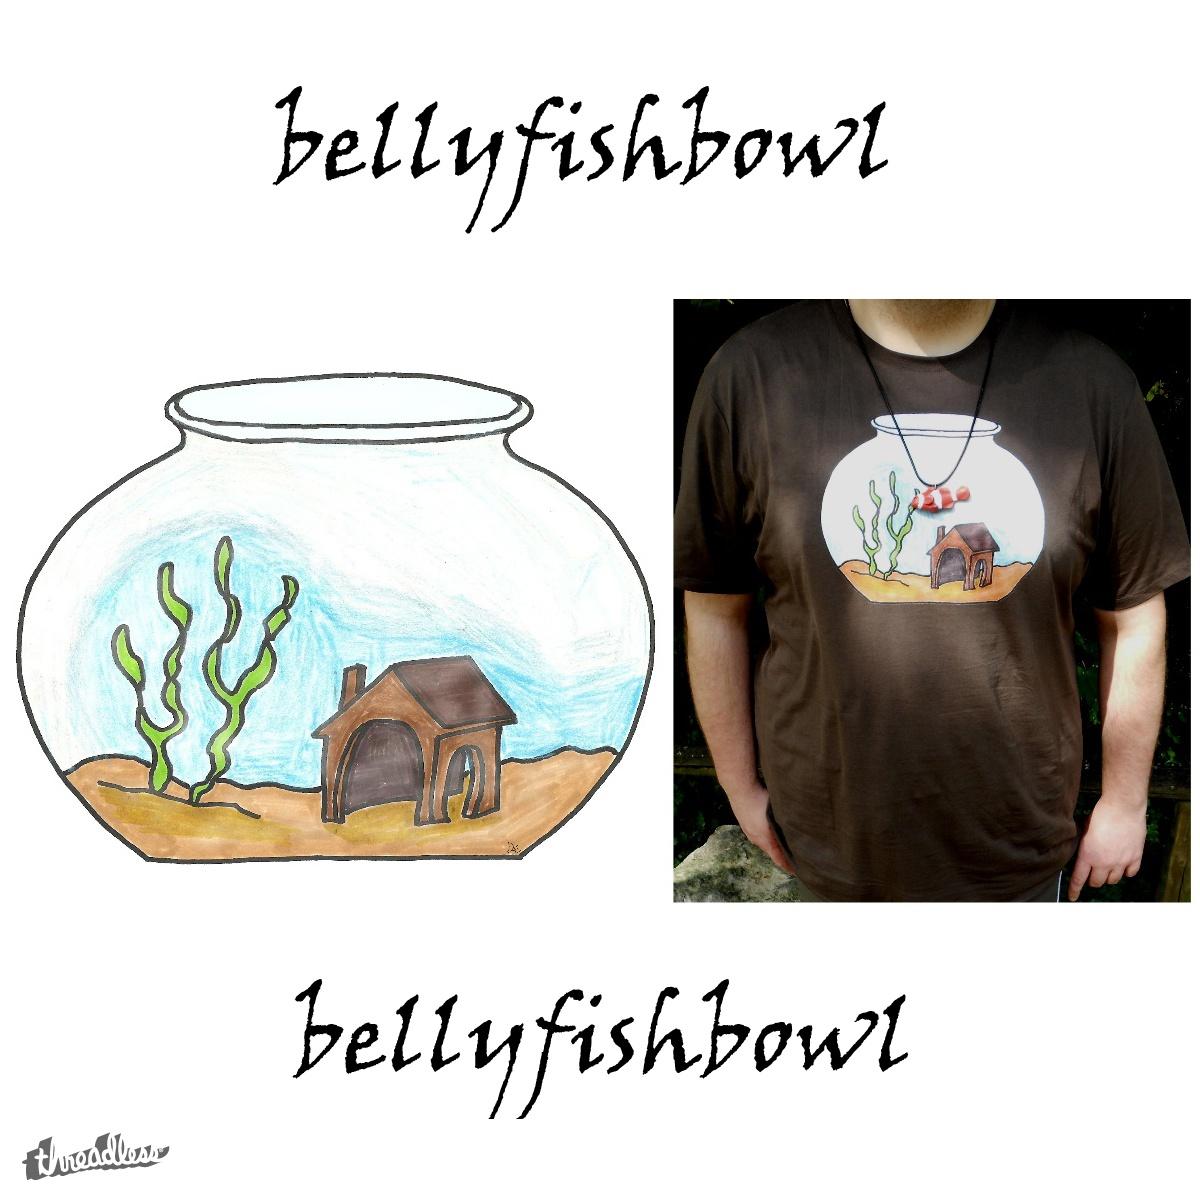 bellyfishbowl by gakuzo on Threadless